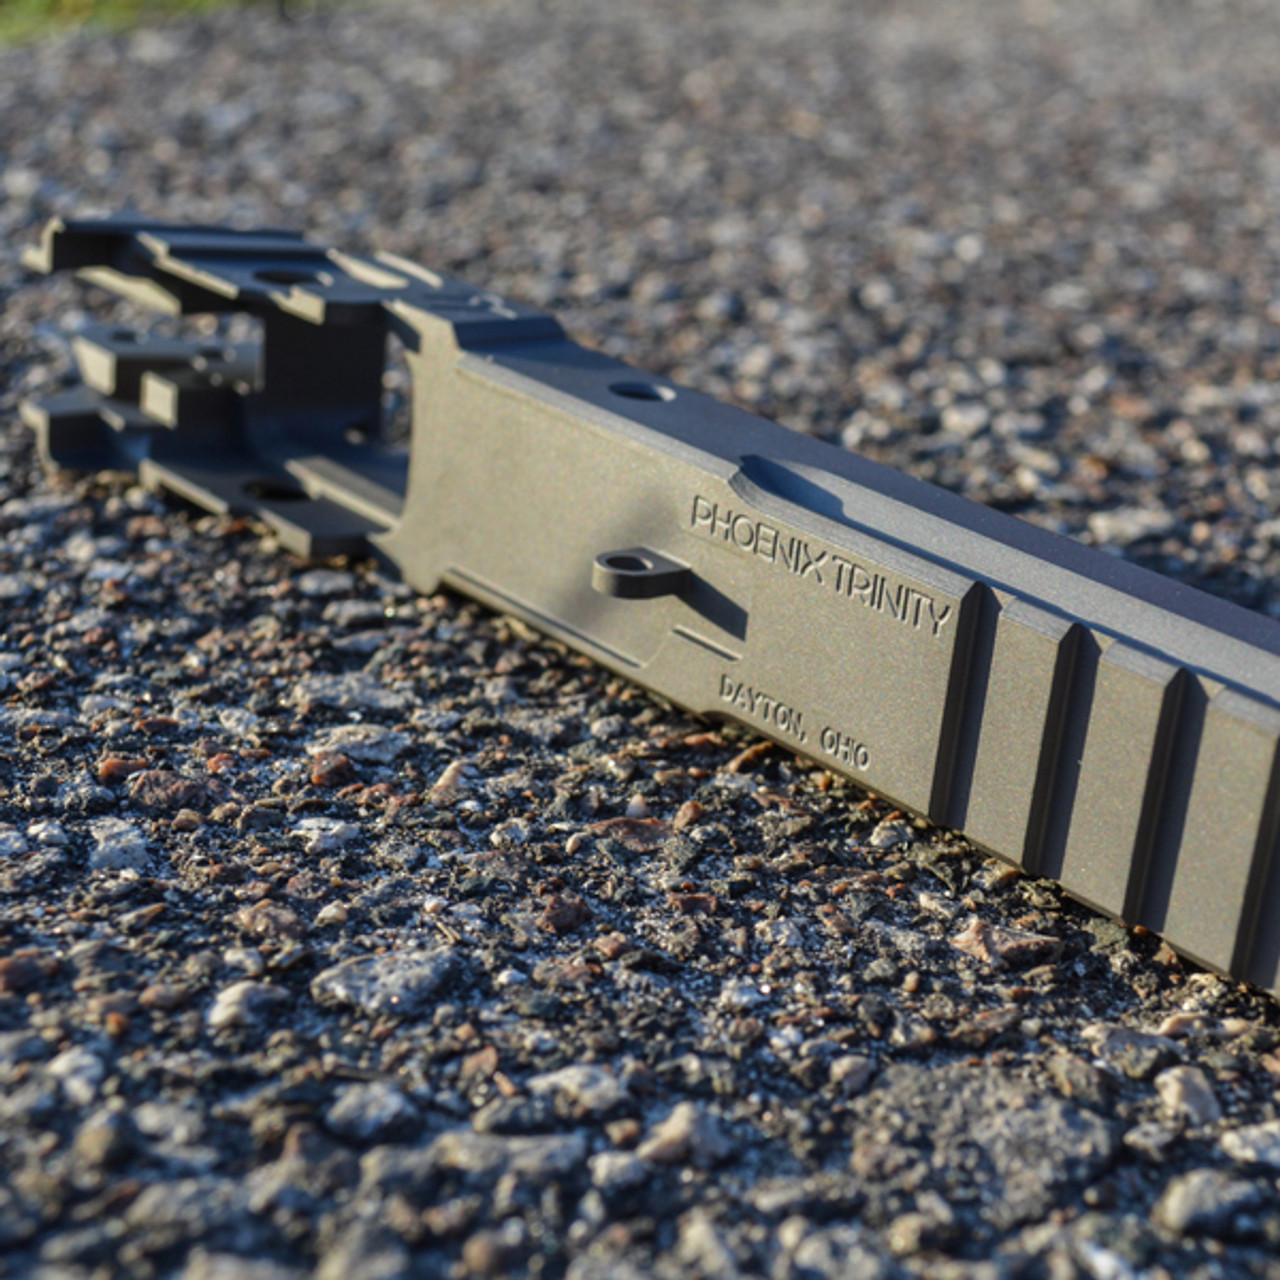 Phoenix Trinity Hi-Cap Tac-Rail 2011 Serialized Frame (Restricted Firearm)